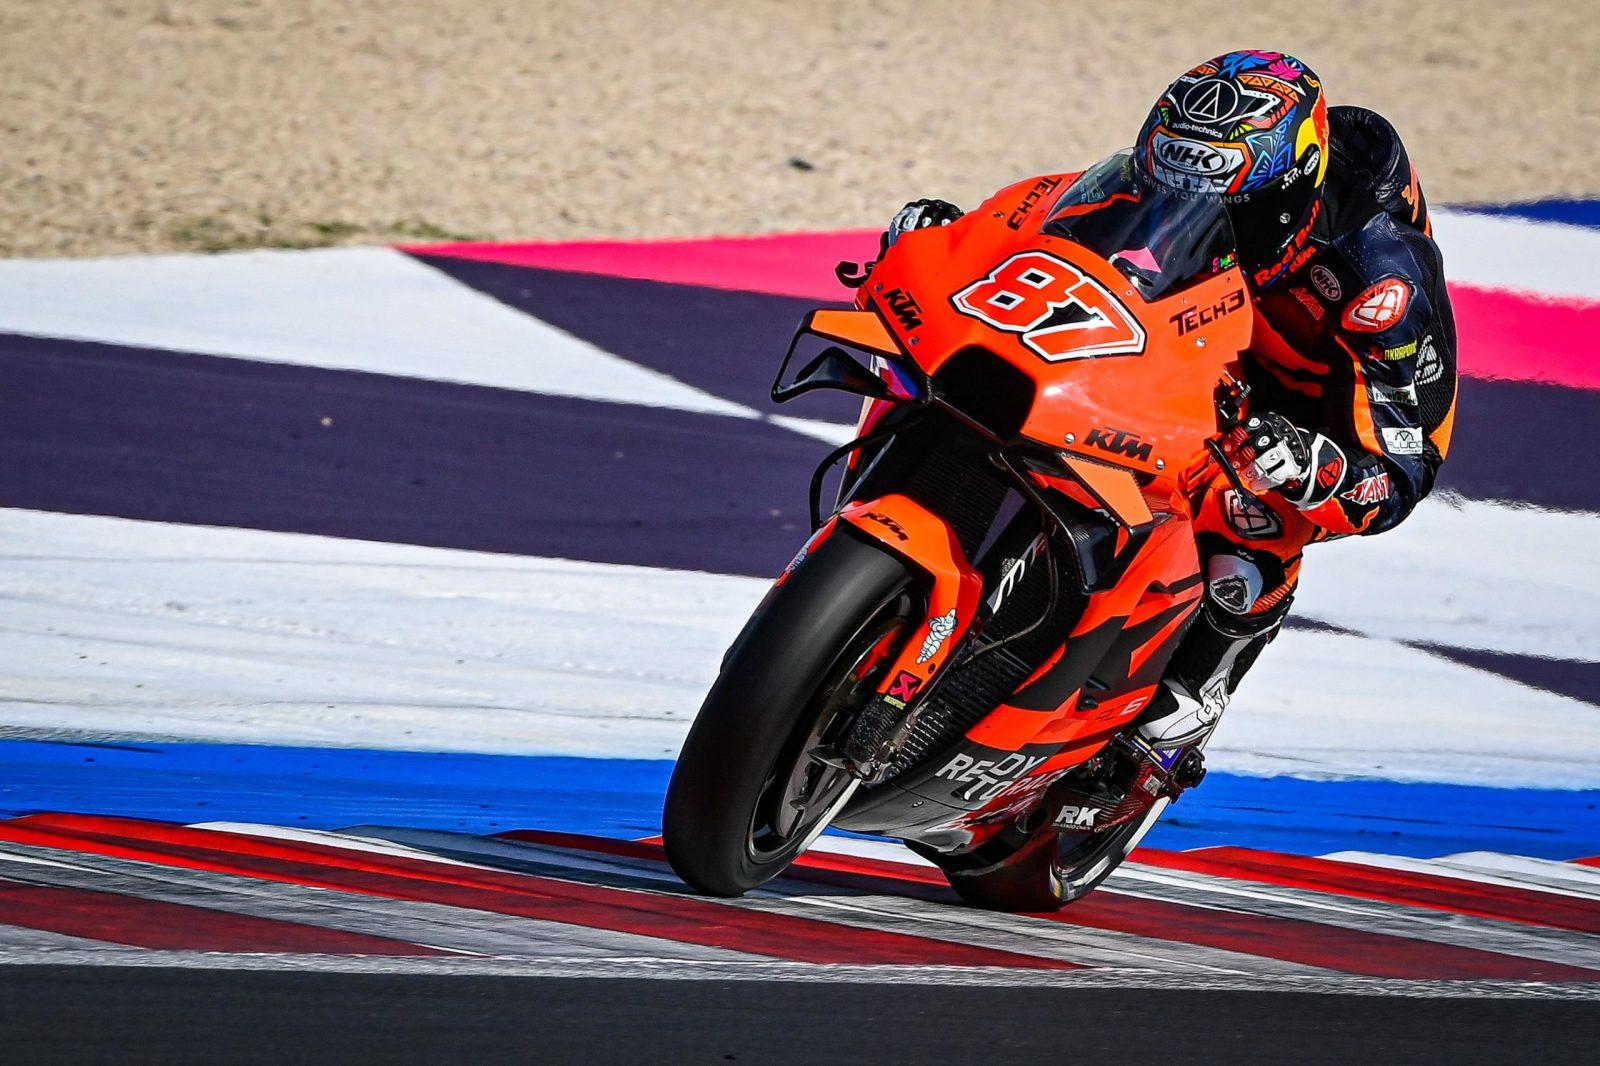 Misano MotoGP Test Summary: A Tale of Six Factories